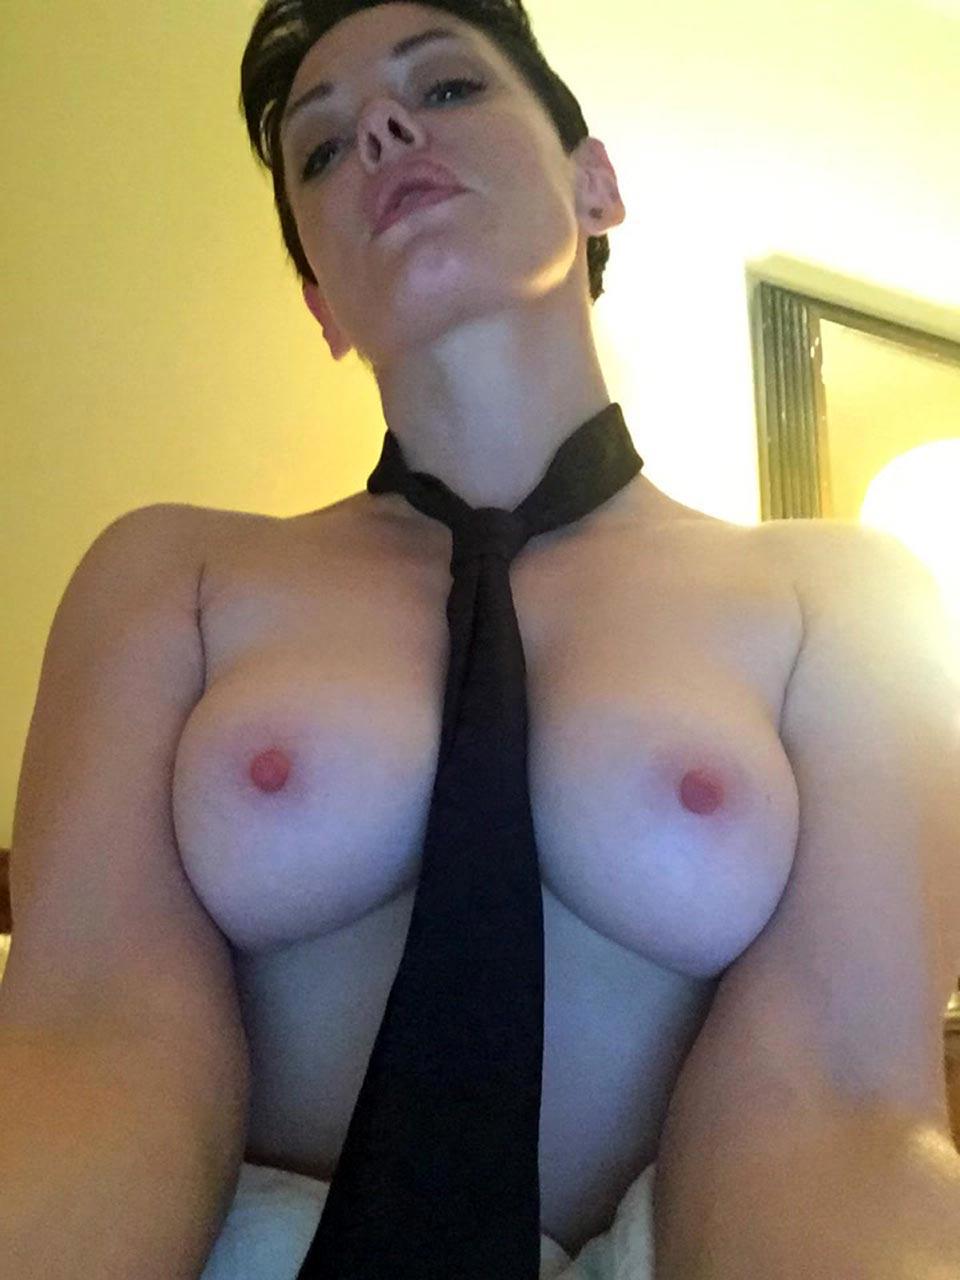 Rose mcgowan nude tits pics